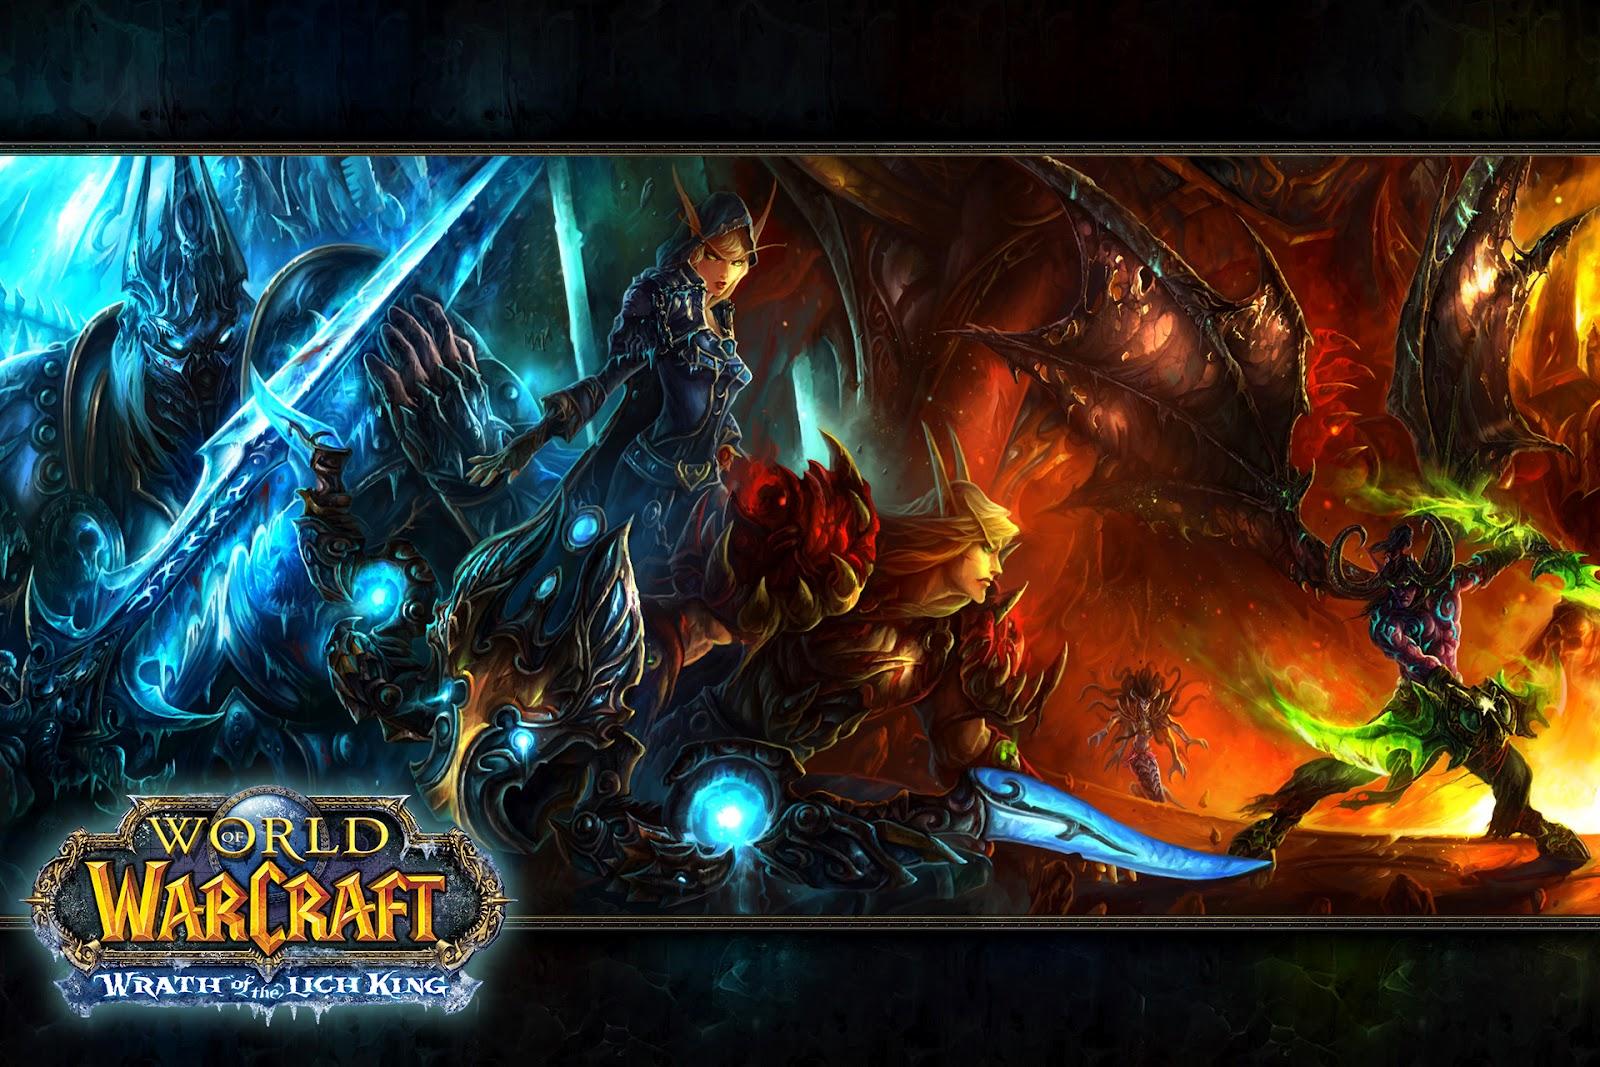 http://3.bp.blogspot.com/-BS5edBQrw34/UAzit8oR9YI/AAAAAAAAB8Q/ALMbhENEhZ4/s1600/world+of+warcraft+wrath+lich+king+wow+wallpaper+background+desktop+mmo+online+blizzard+game.jpg